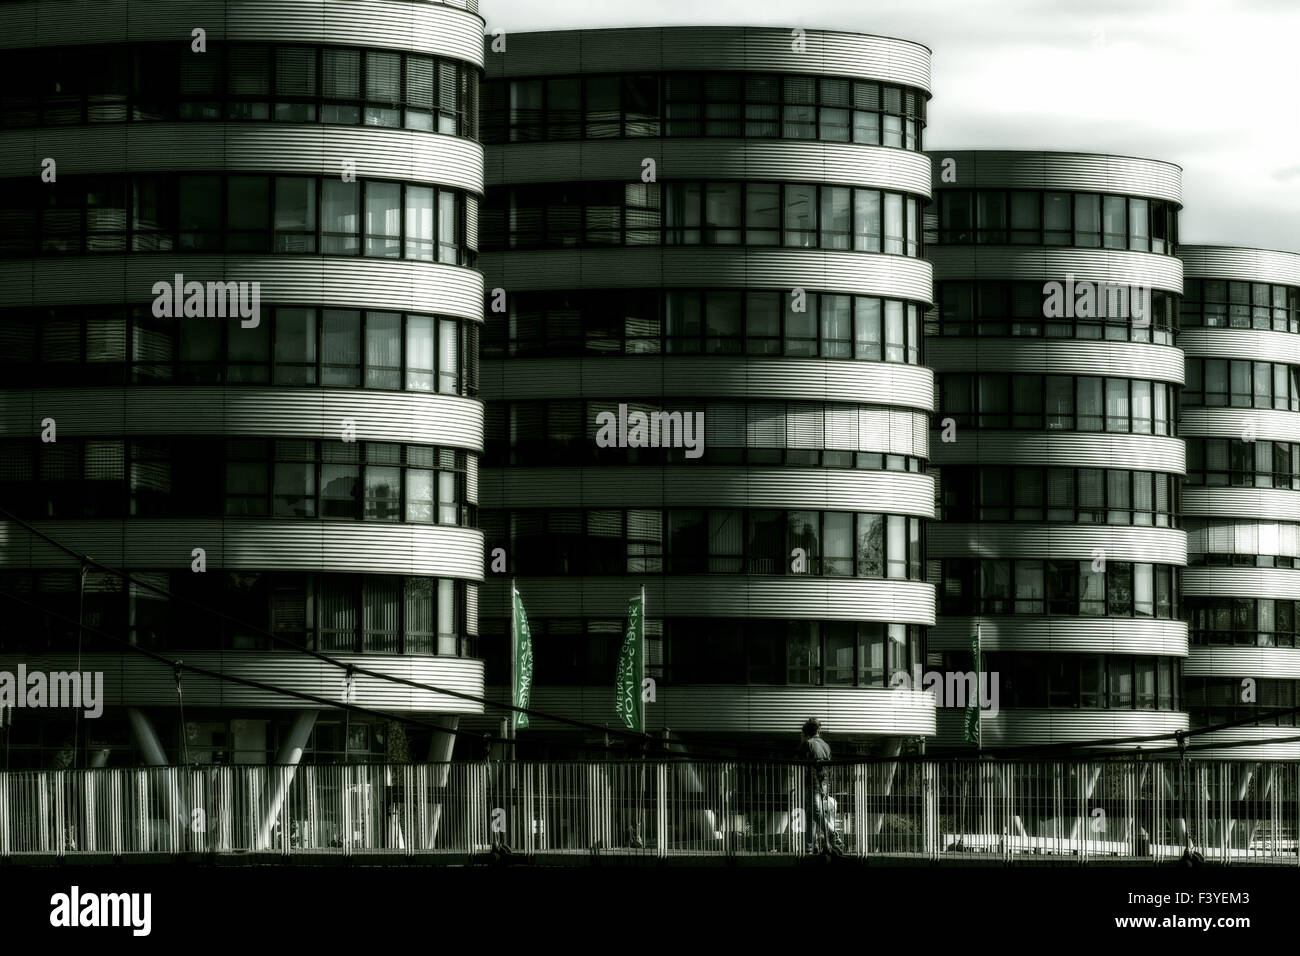 modern era architecture - Stock Image